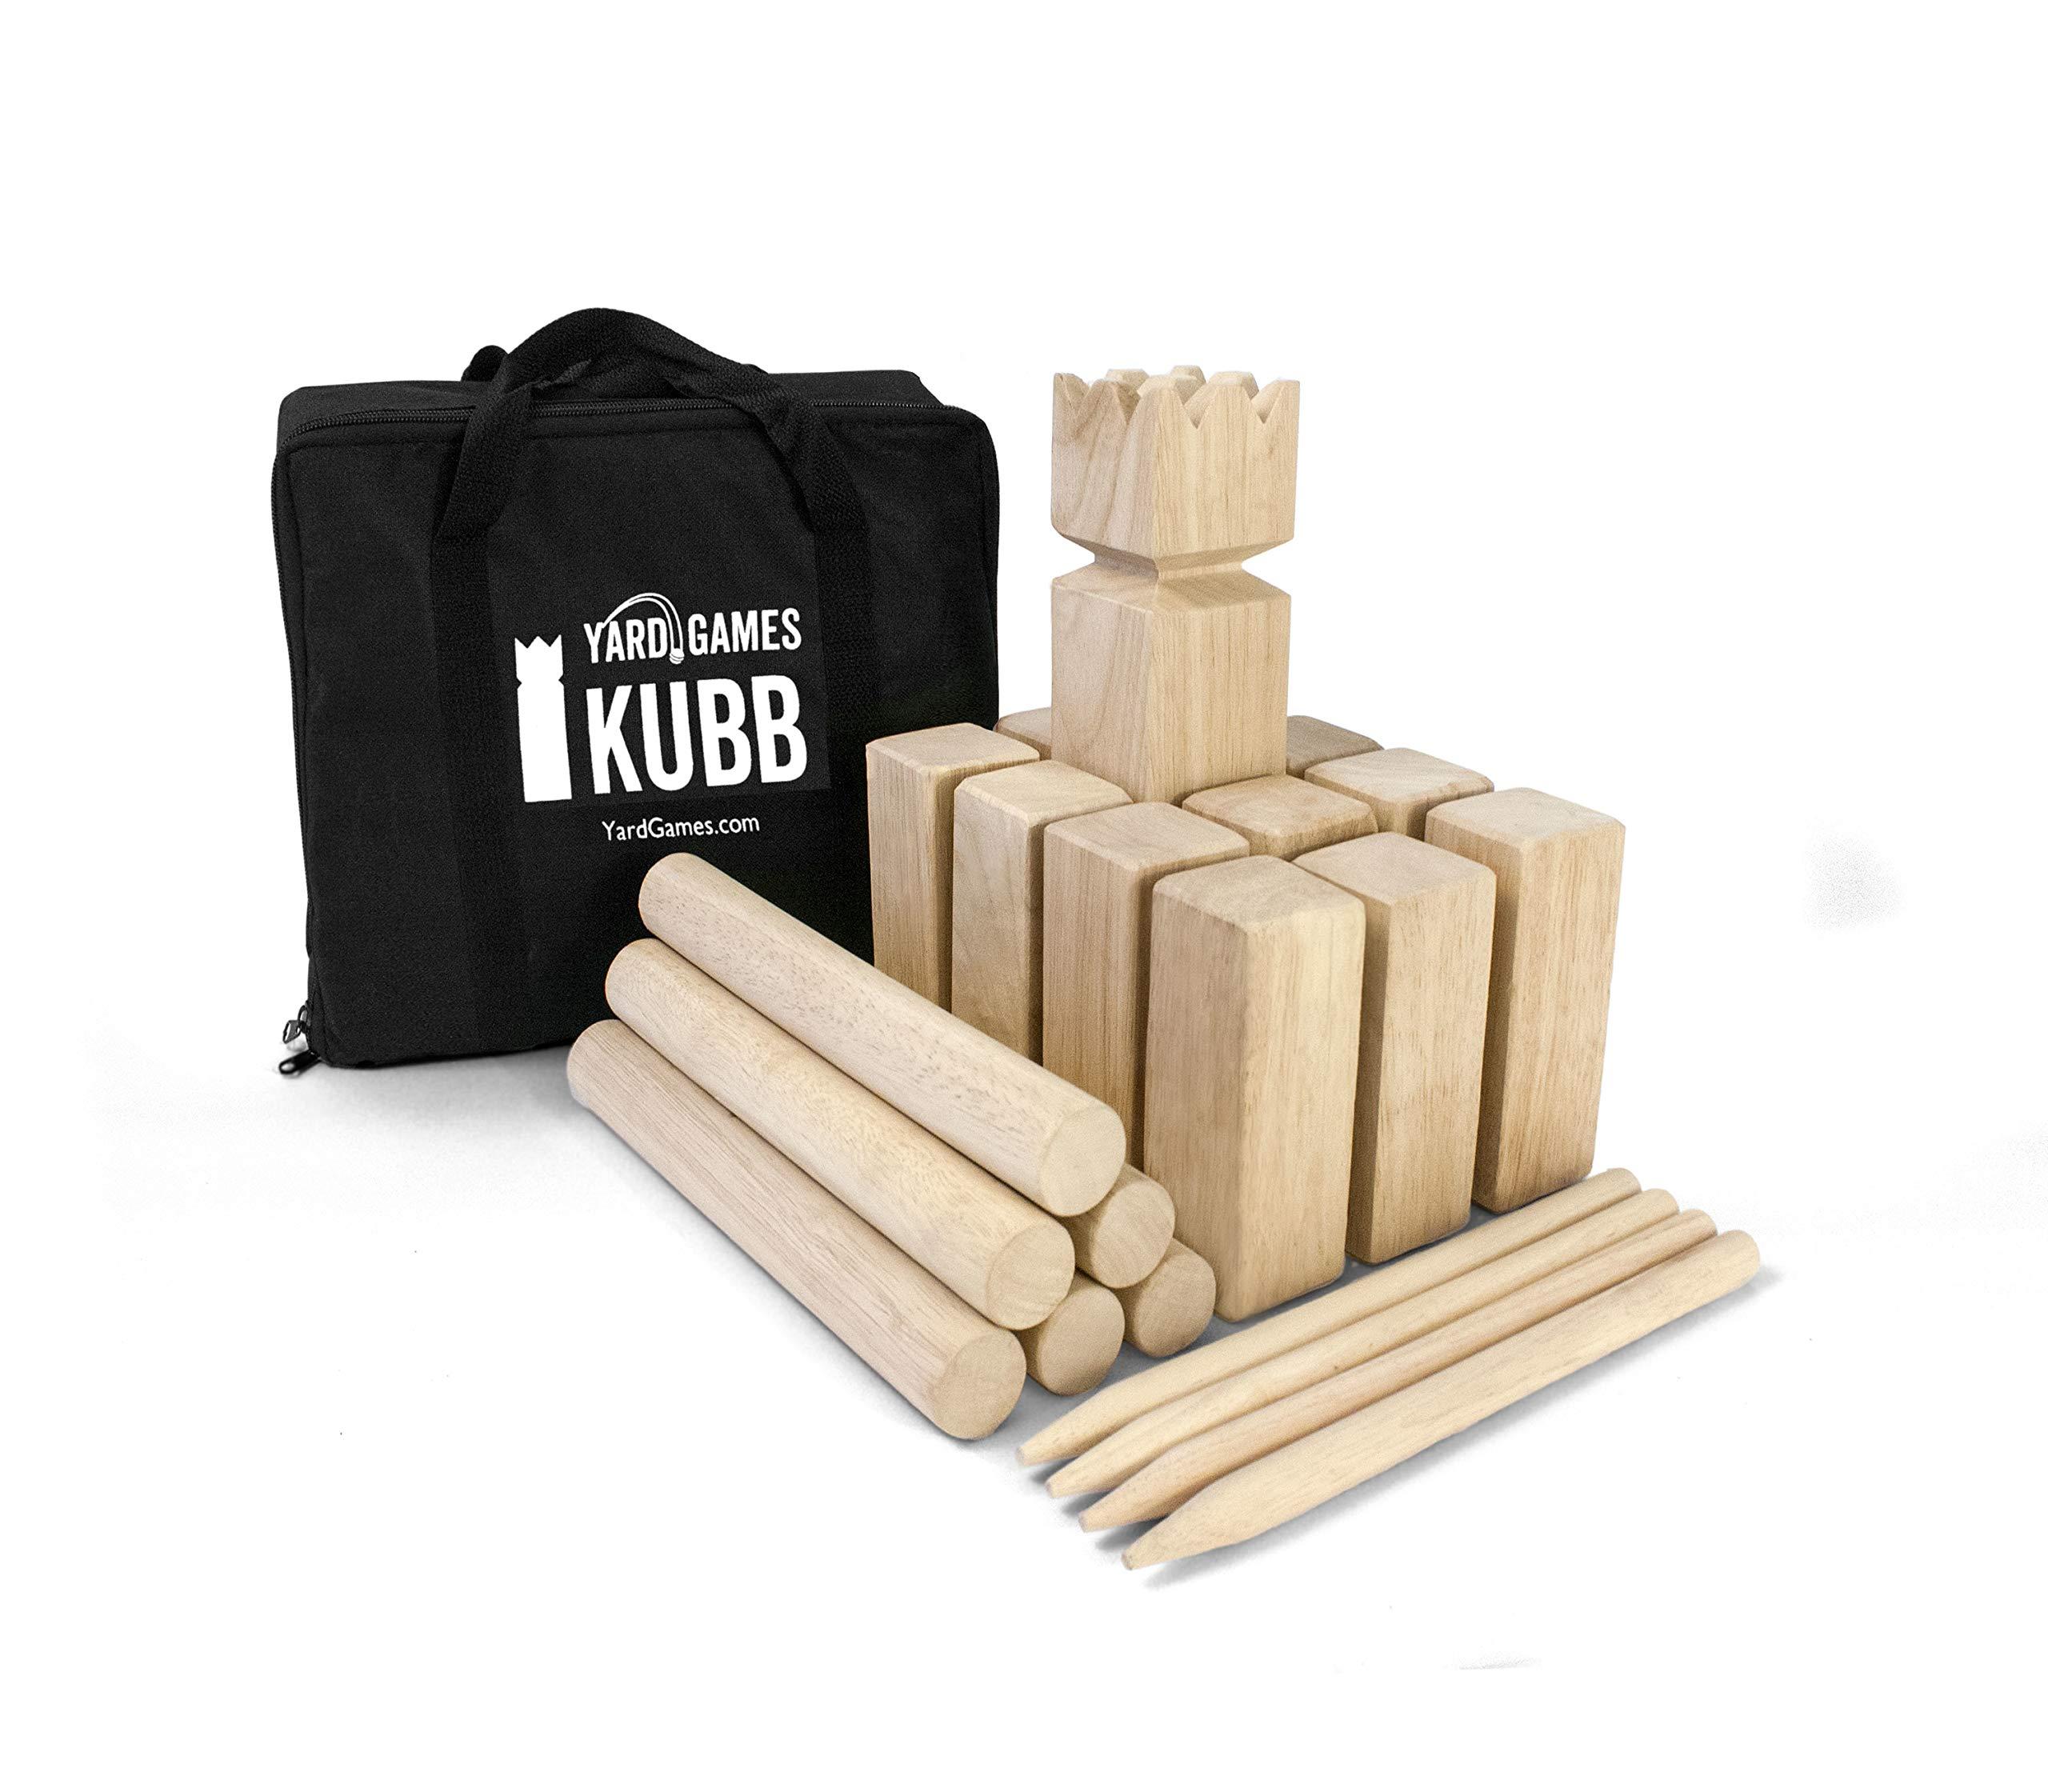 Yard Games Kubb Game Premium Set by Yard Games